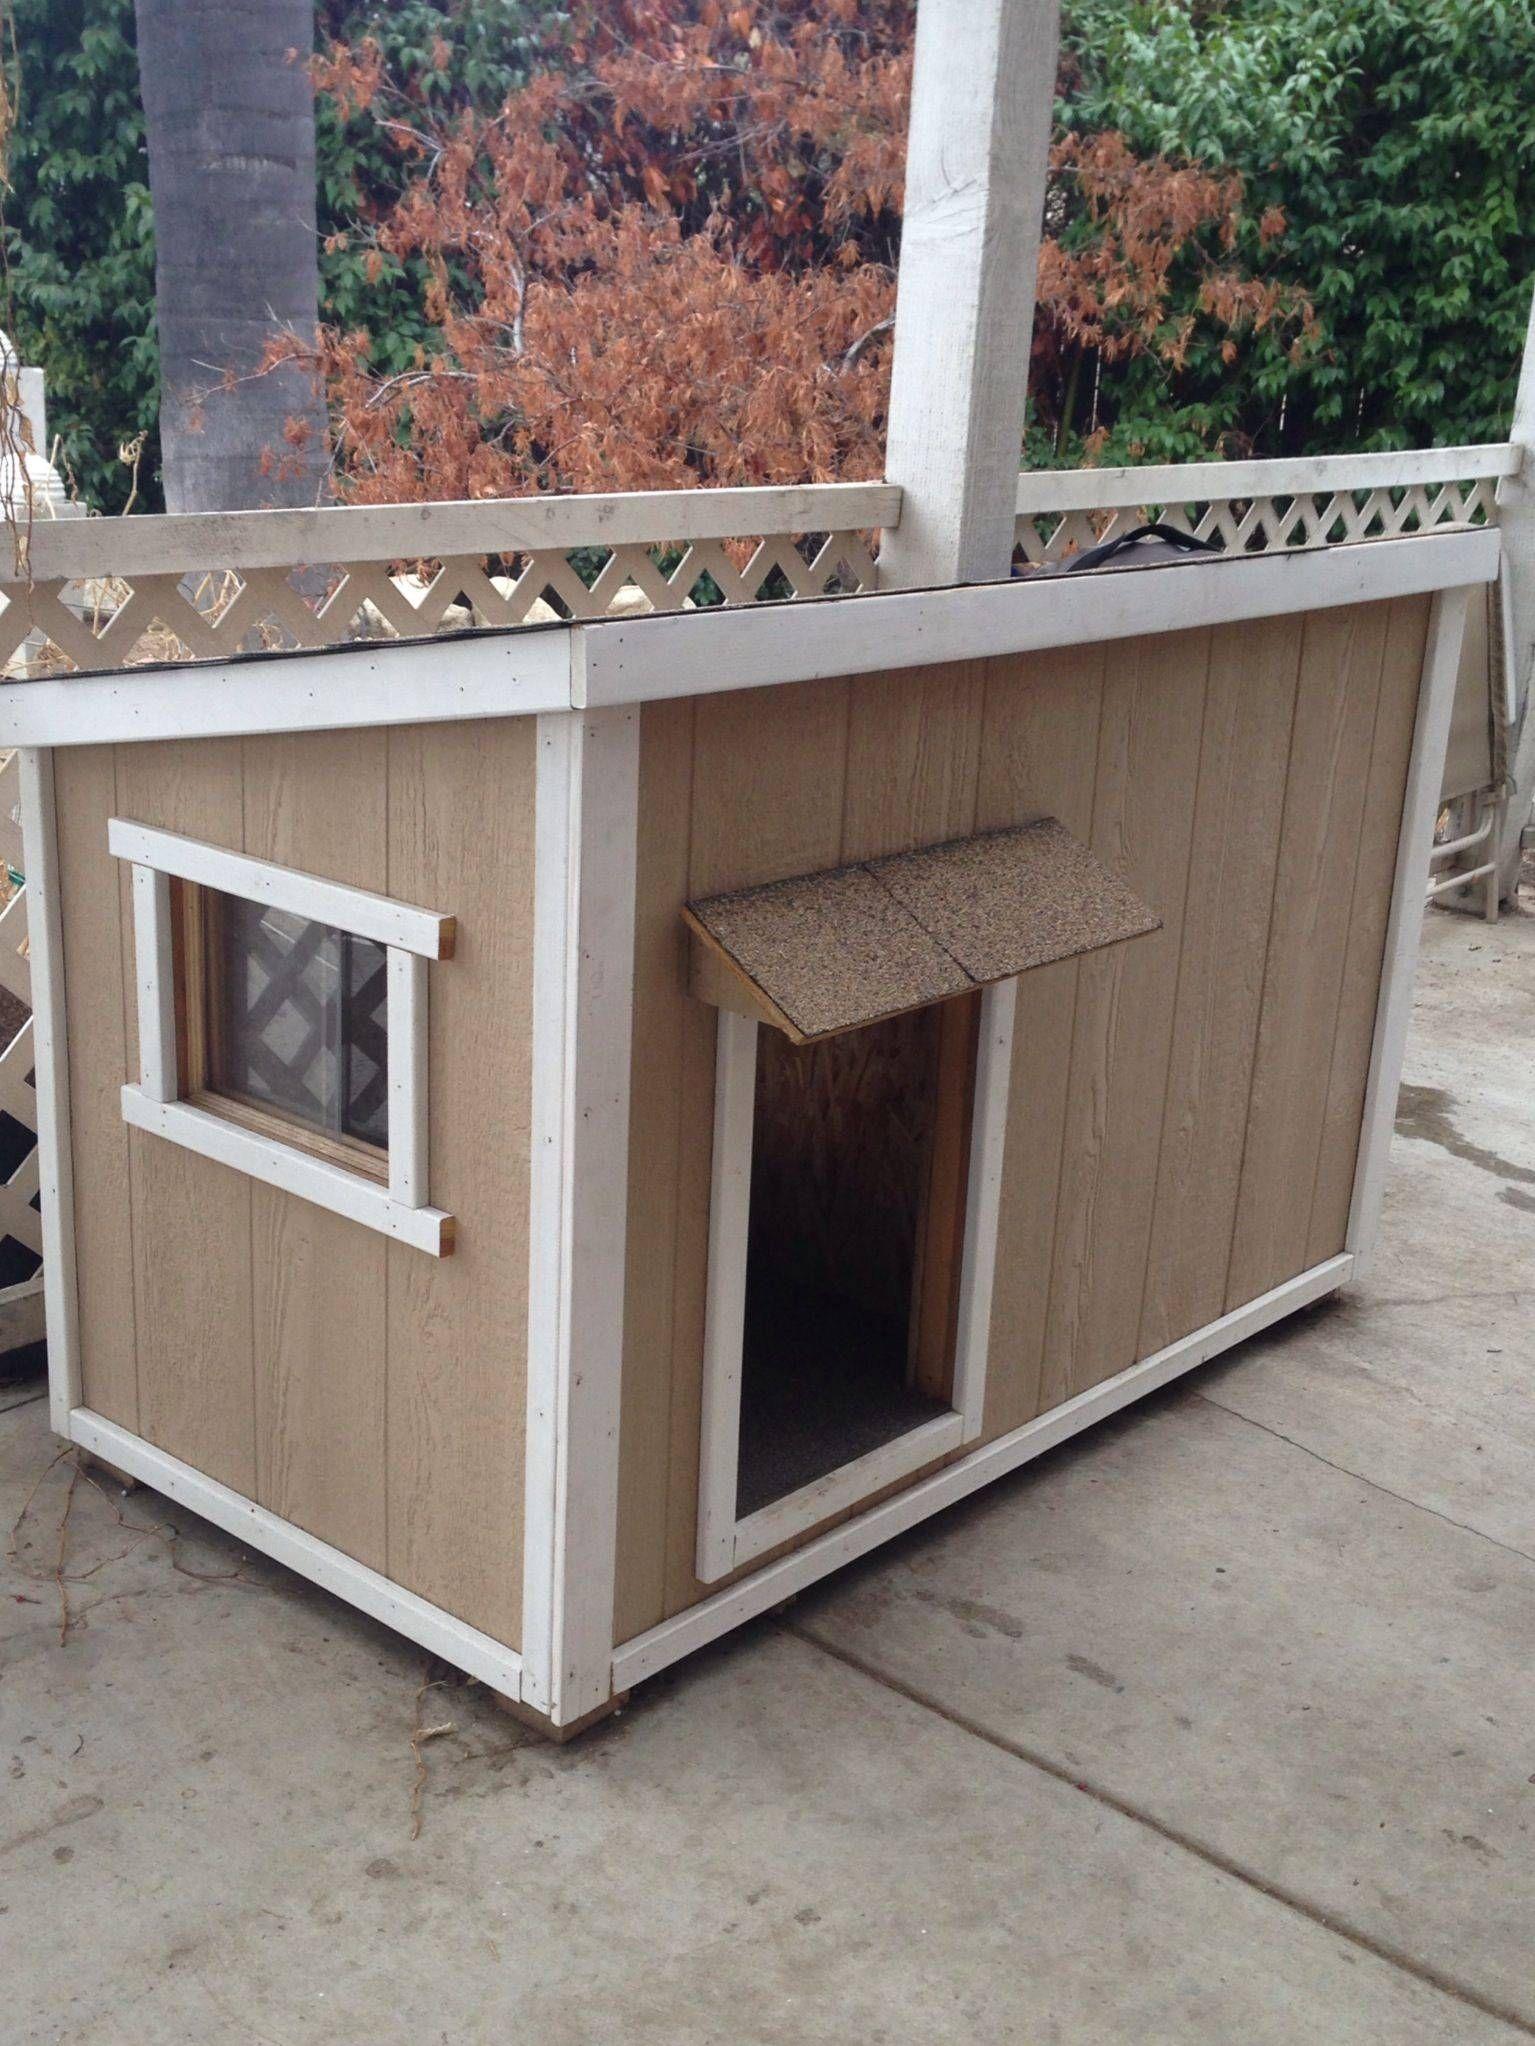 Modern Dog House Buildingdesign Homedesign Architecture Home Design Housedesignidea Privatehomedesign Insulated Dog House Dog House Diy Dog House Plans